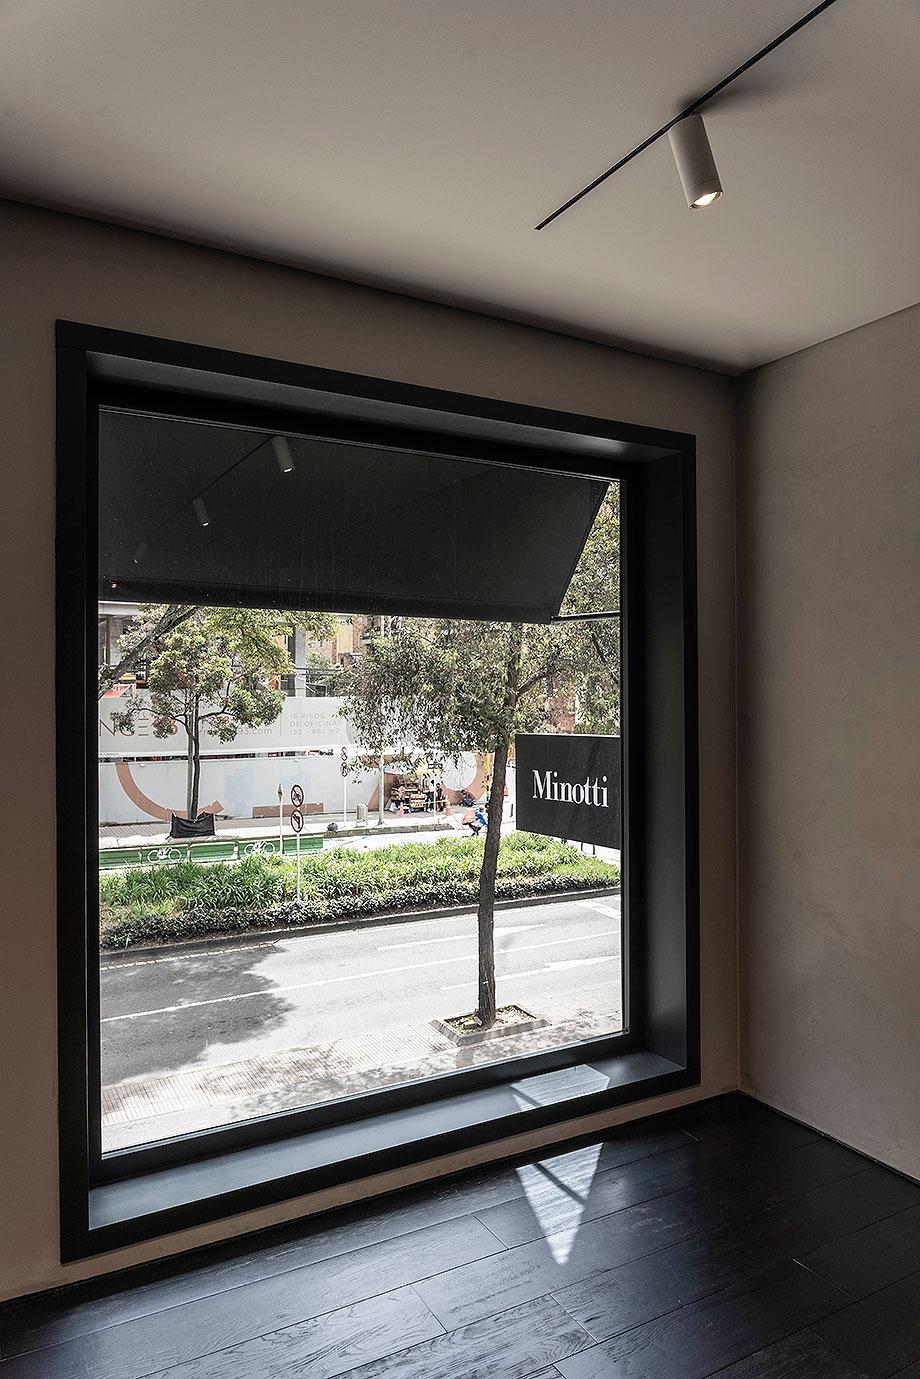 minotti flagship store by schaller en bogota de sandra de nutte (14) - foto mateo perez